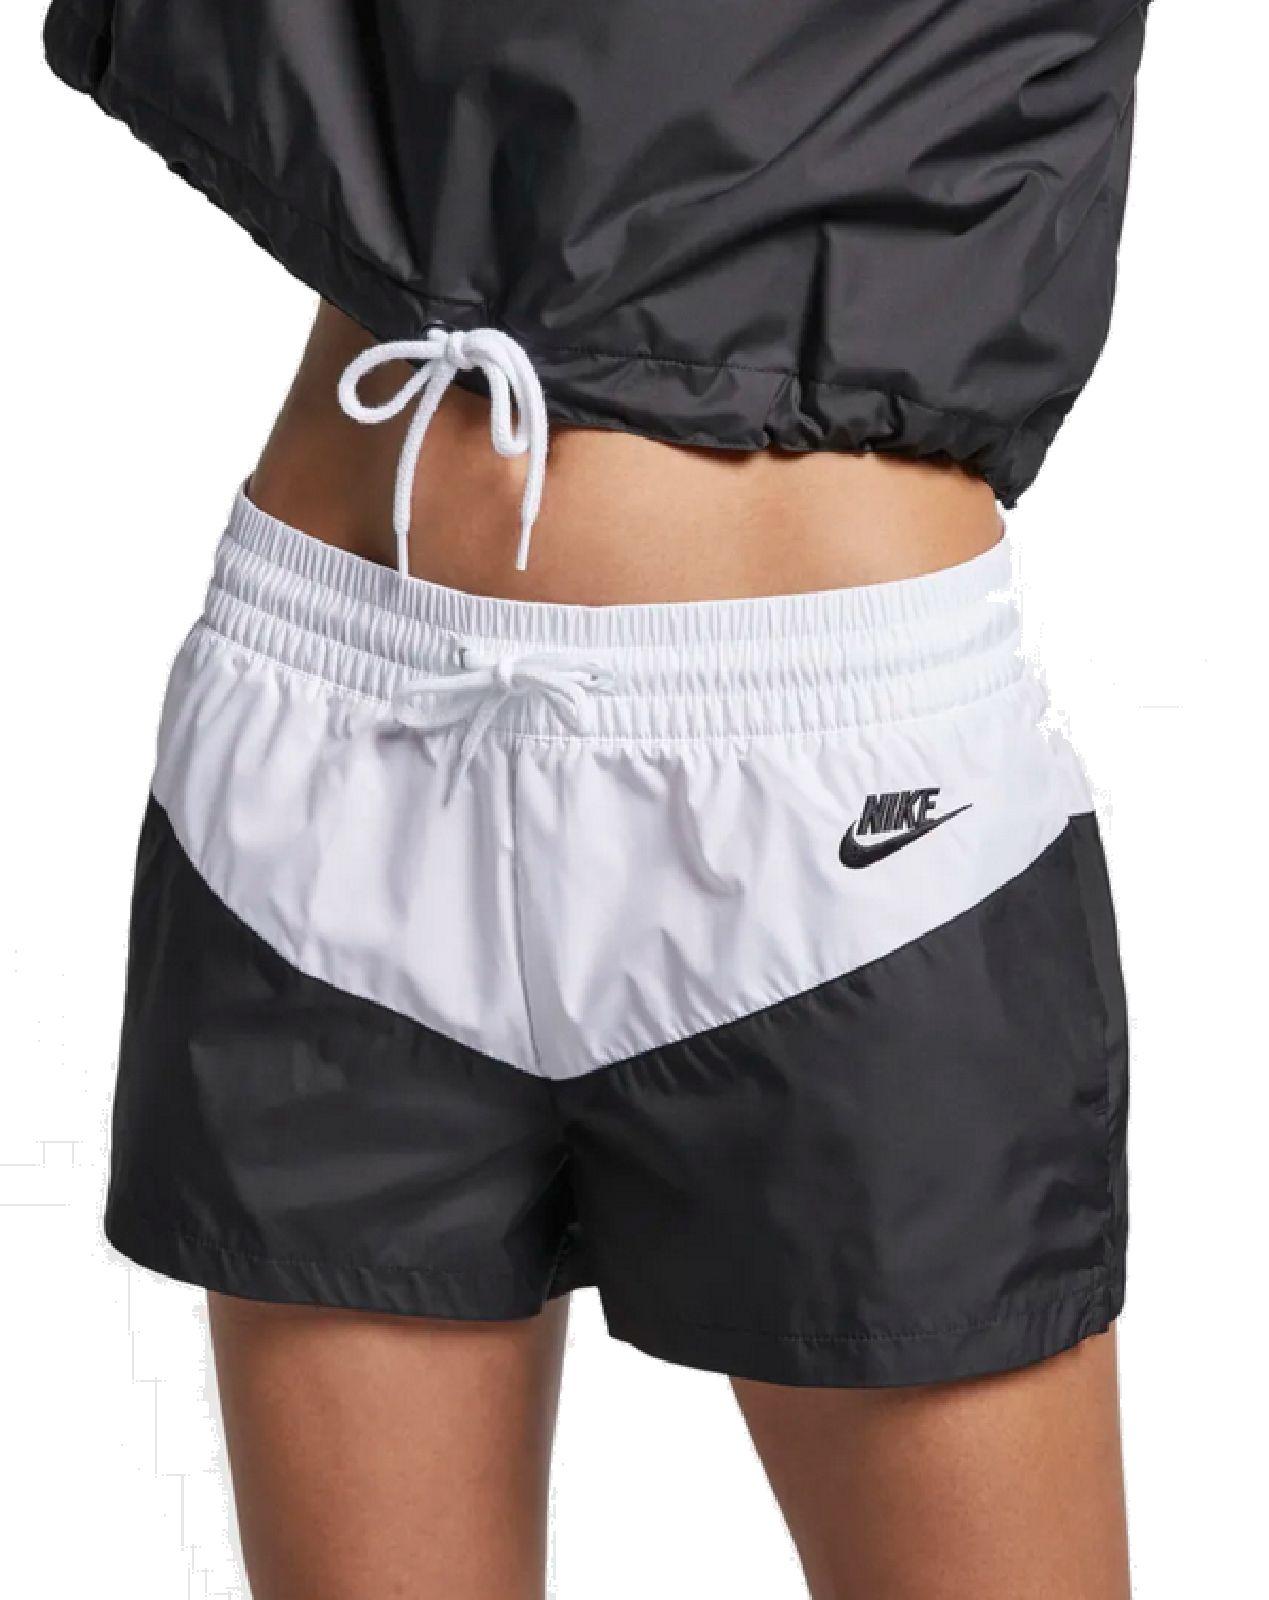 short negroeBay Nike blanco entrenamiento NSW señora W short nike libre tiempo HRTG fitness J31KcTlF